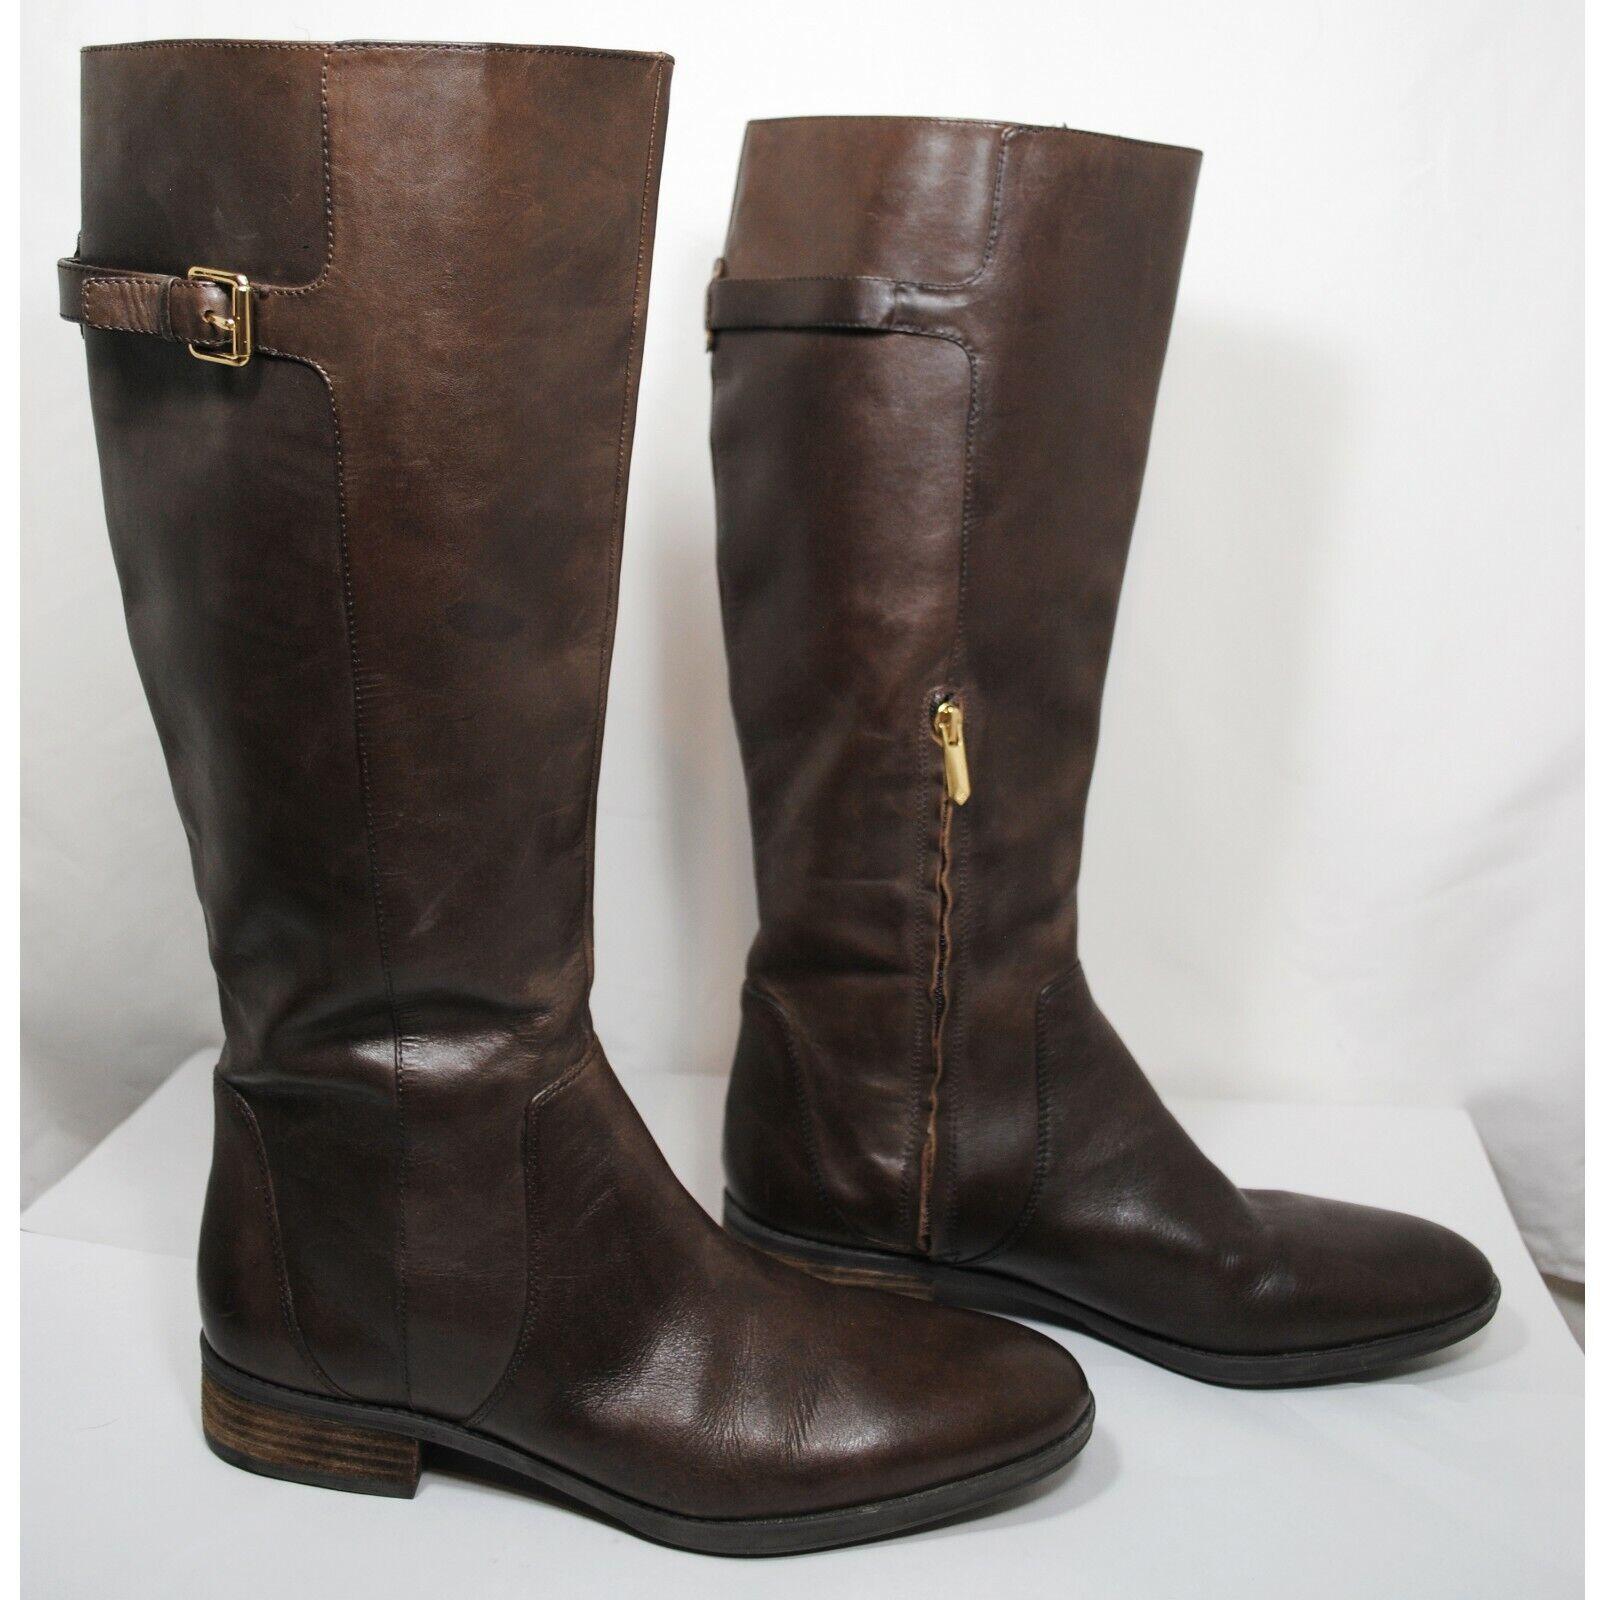 Sam Edelman Patton Espresso Brown Leather Riding Boot Women's US11 M